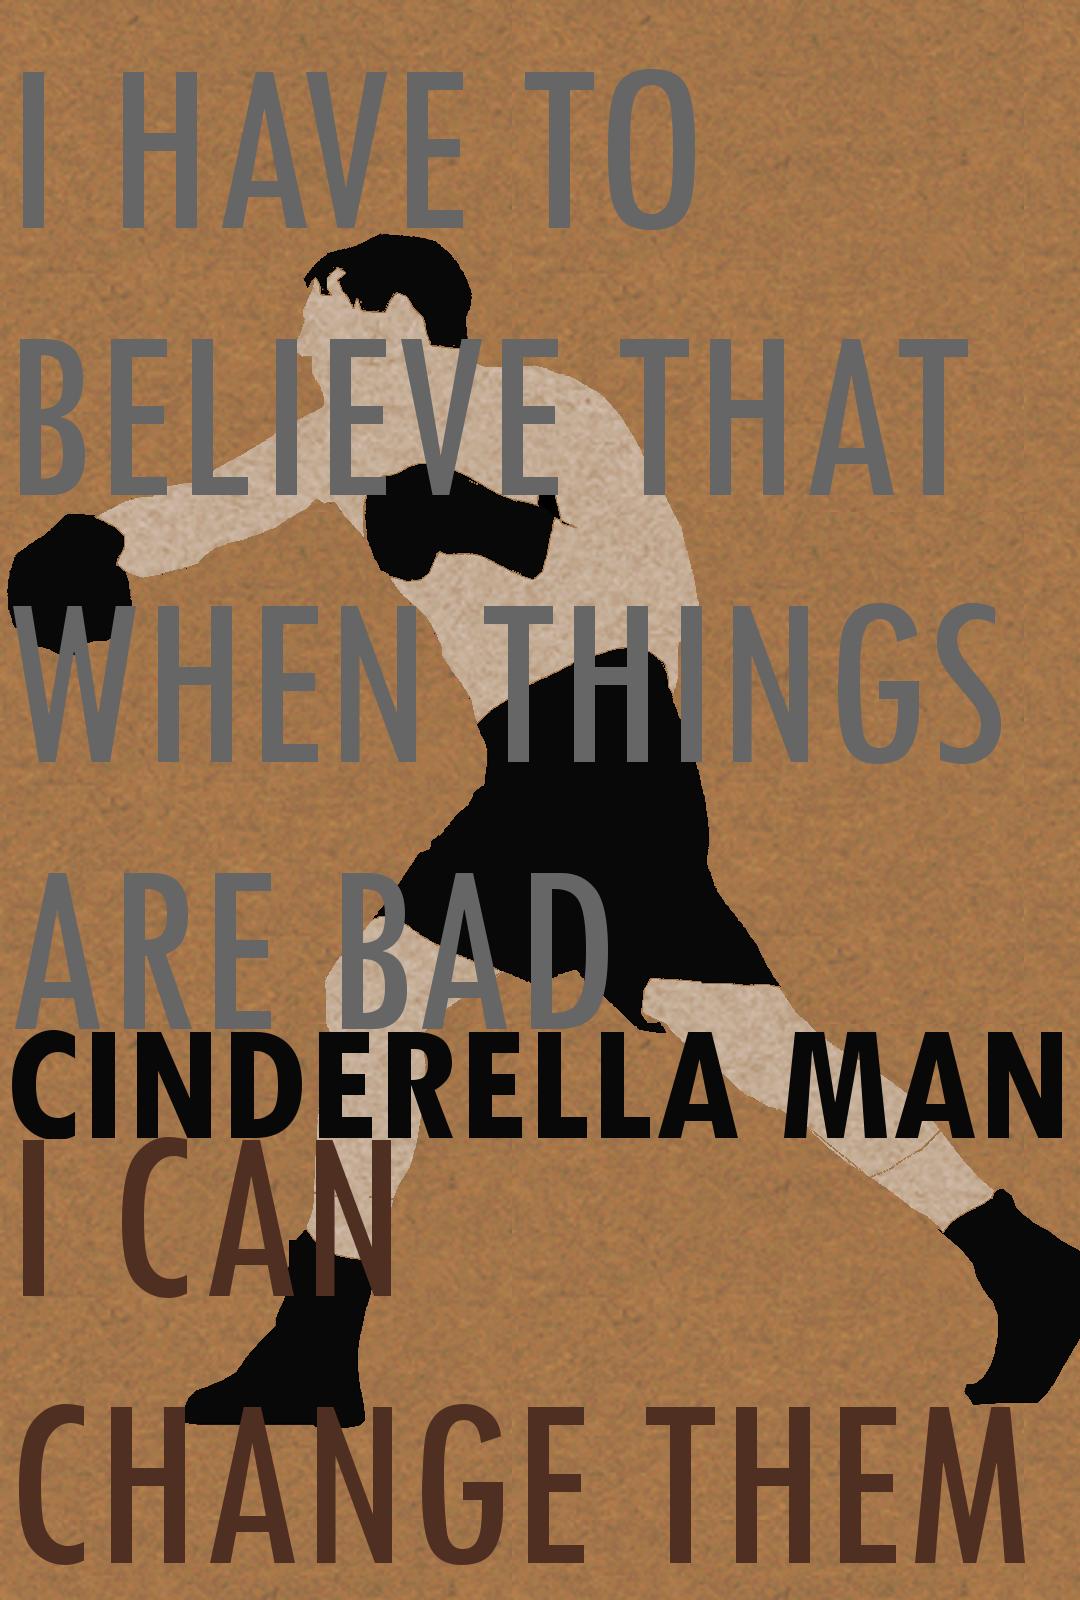 Cinderella Man Quotes Cinderella Man Minimalist Poster  Moviesal  Pinterest